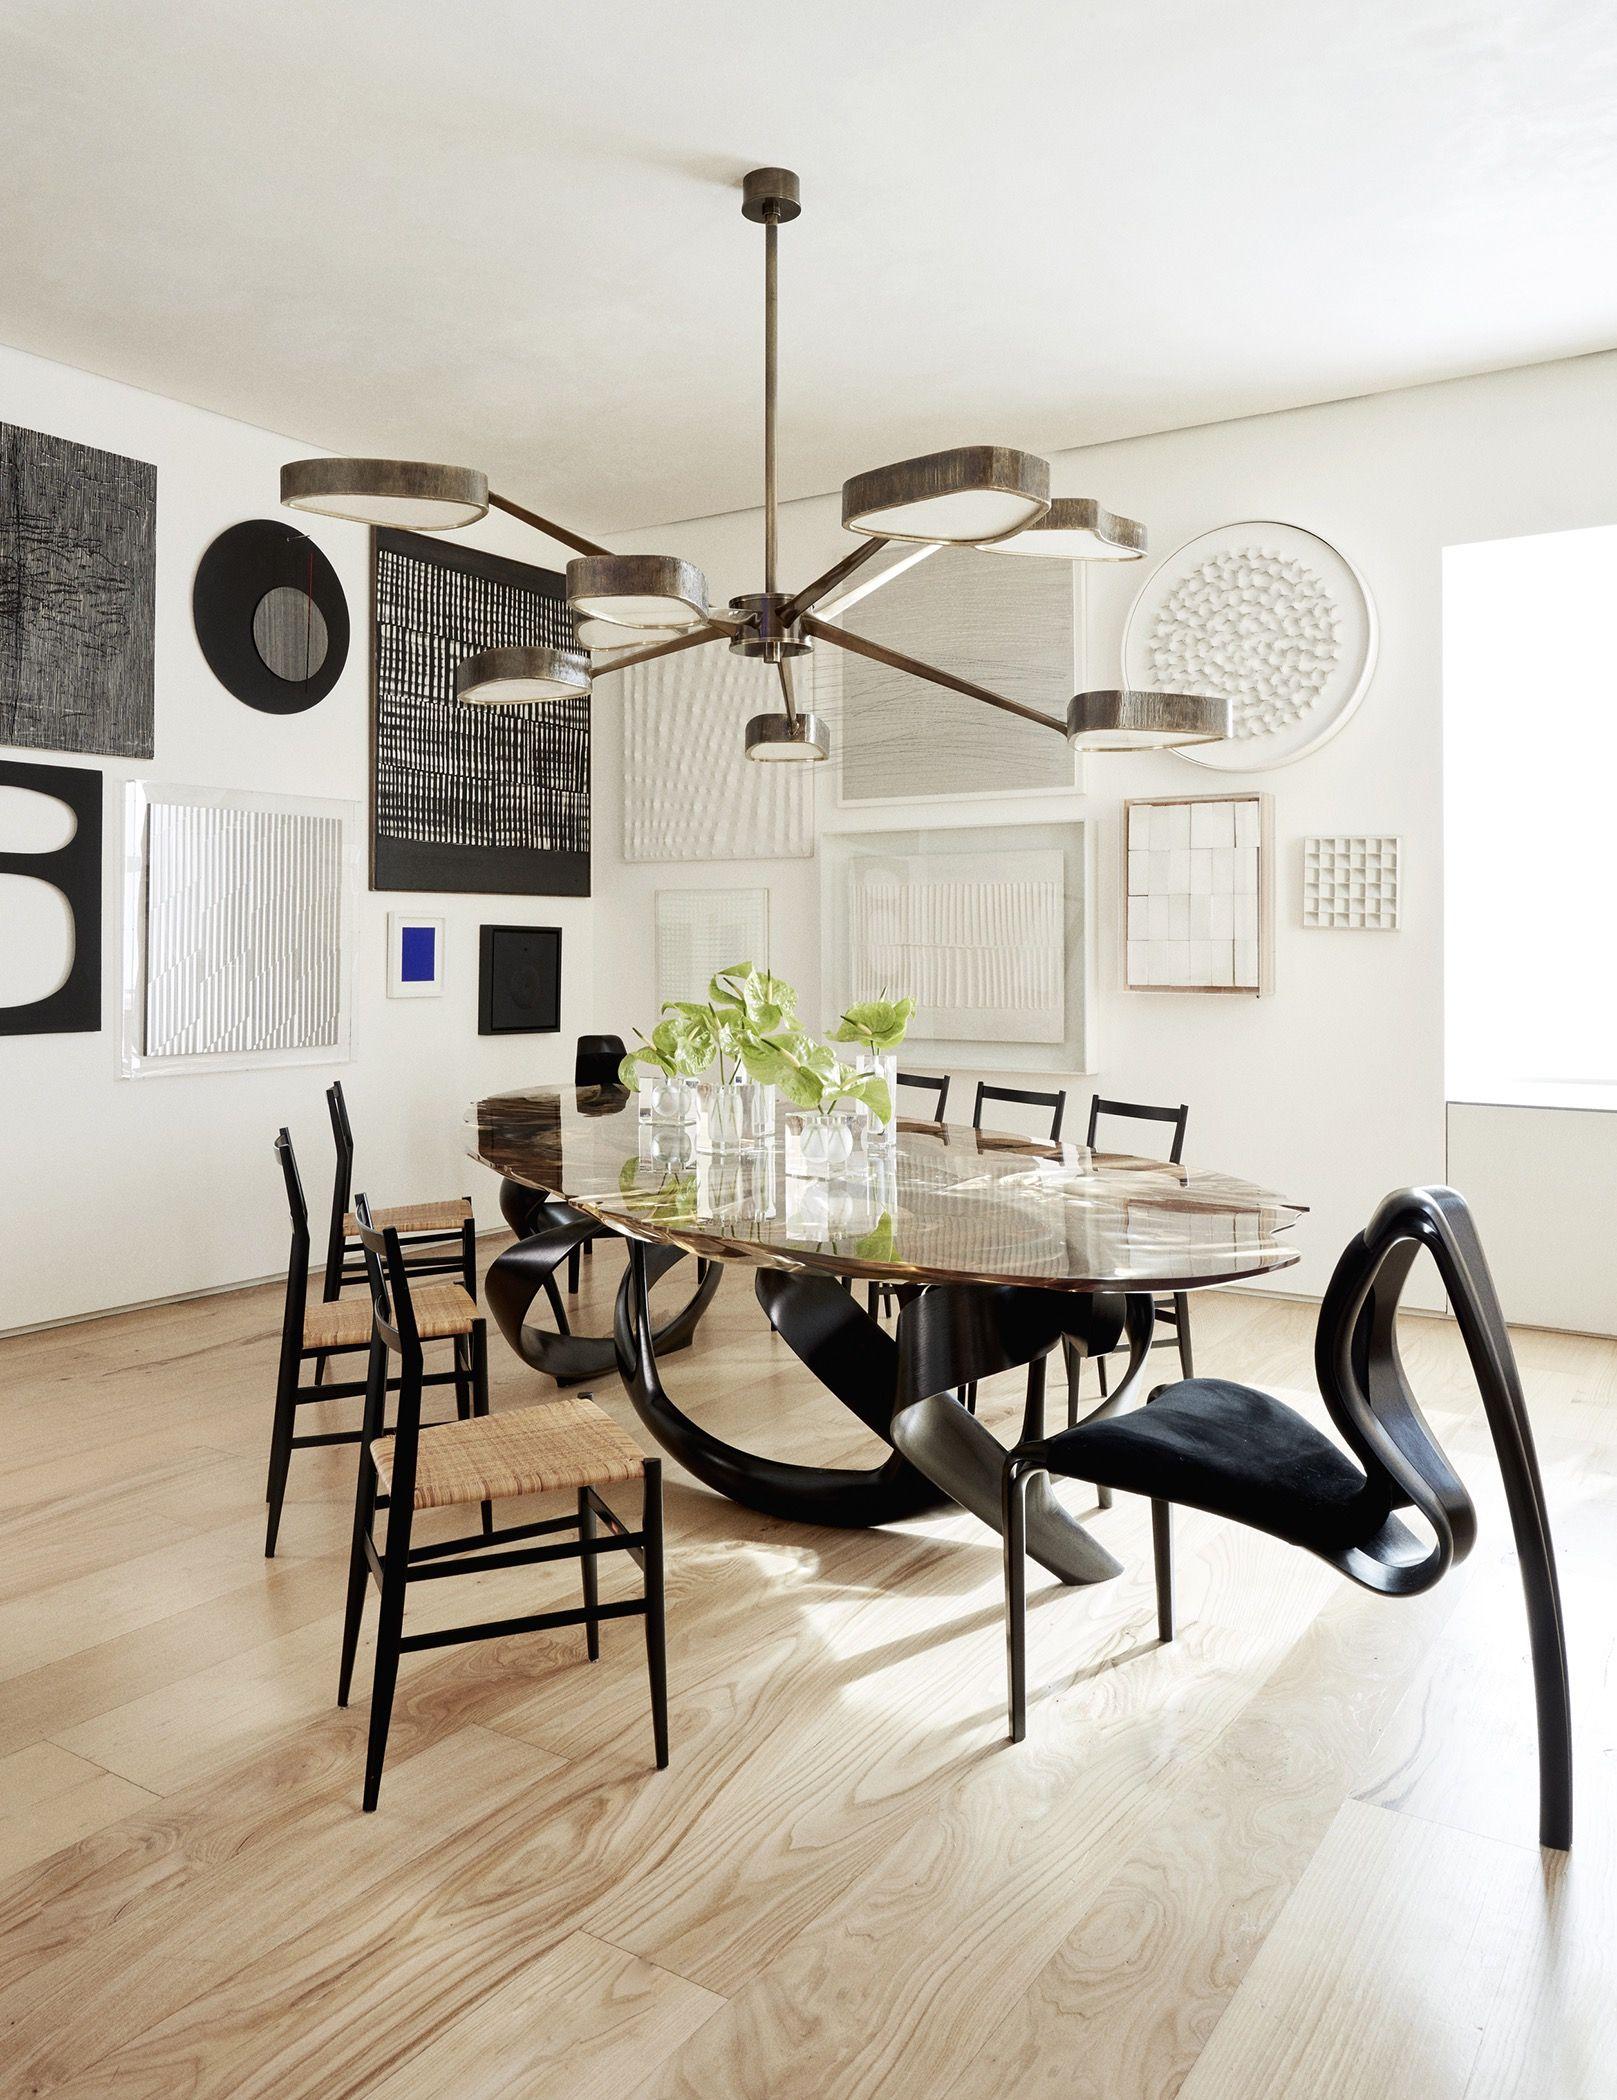 Modern hallway furniture ideas  Park Avenue Triplex  an inspiring art and design collections by Amy